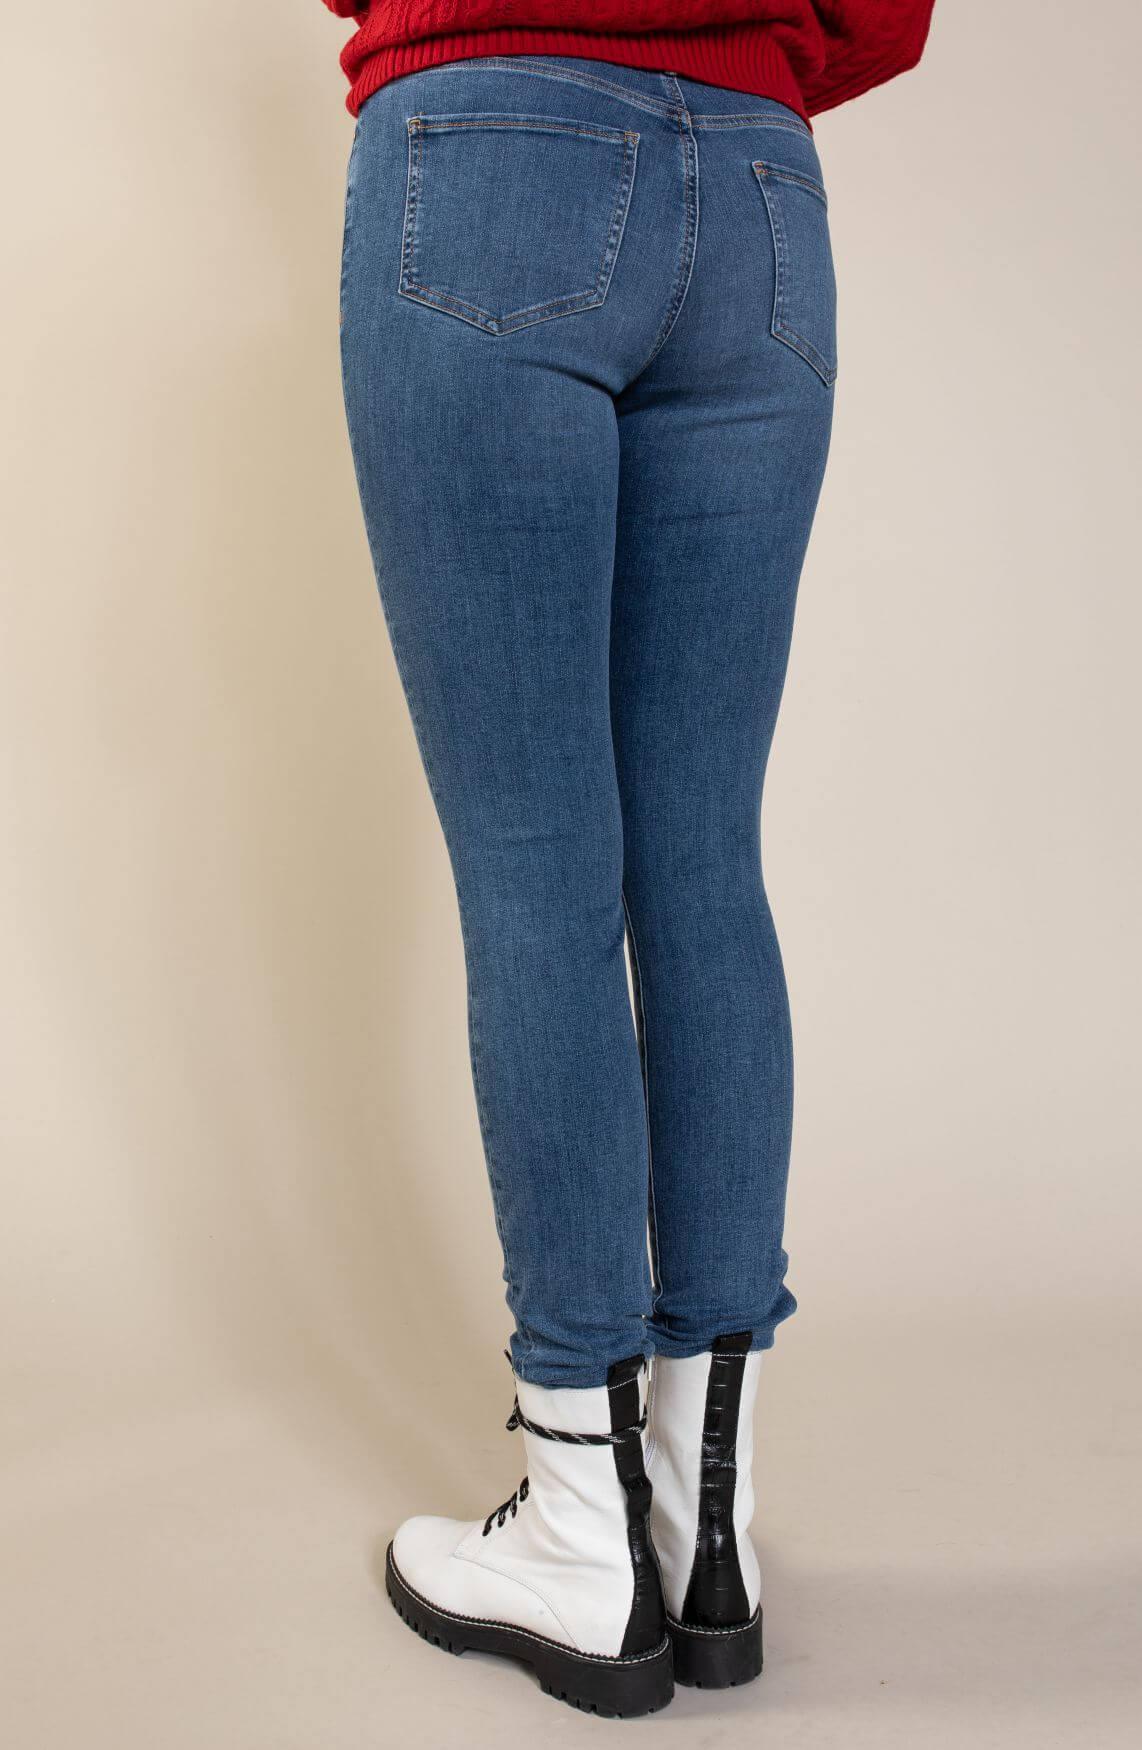 Tommy Hilfiger Dames Skinny jeans Blauw